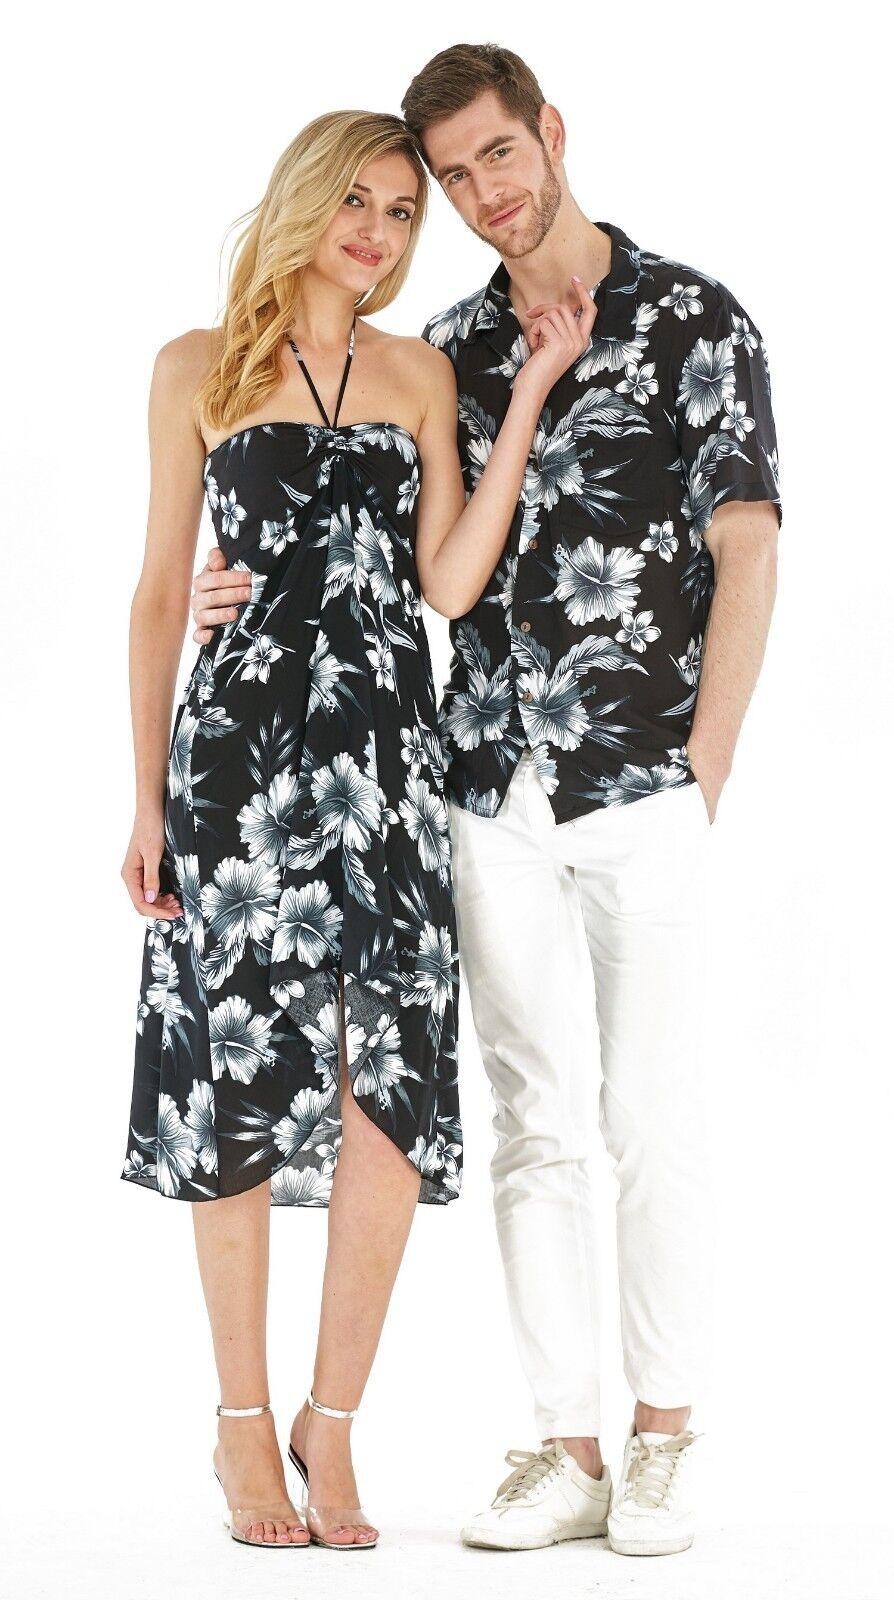 Hawaii Hangover Couple Matching Hawaiian Luau Cruise Midnight Bloom Floral Black